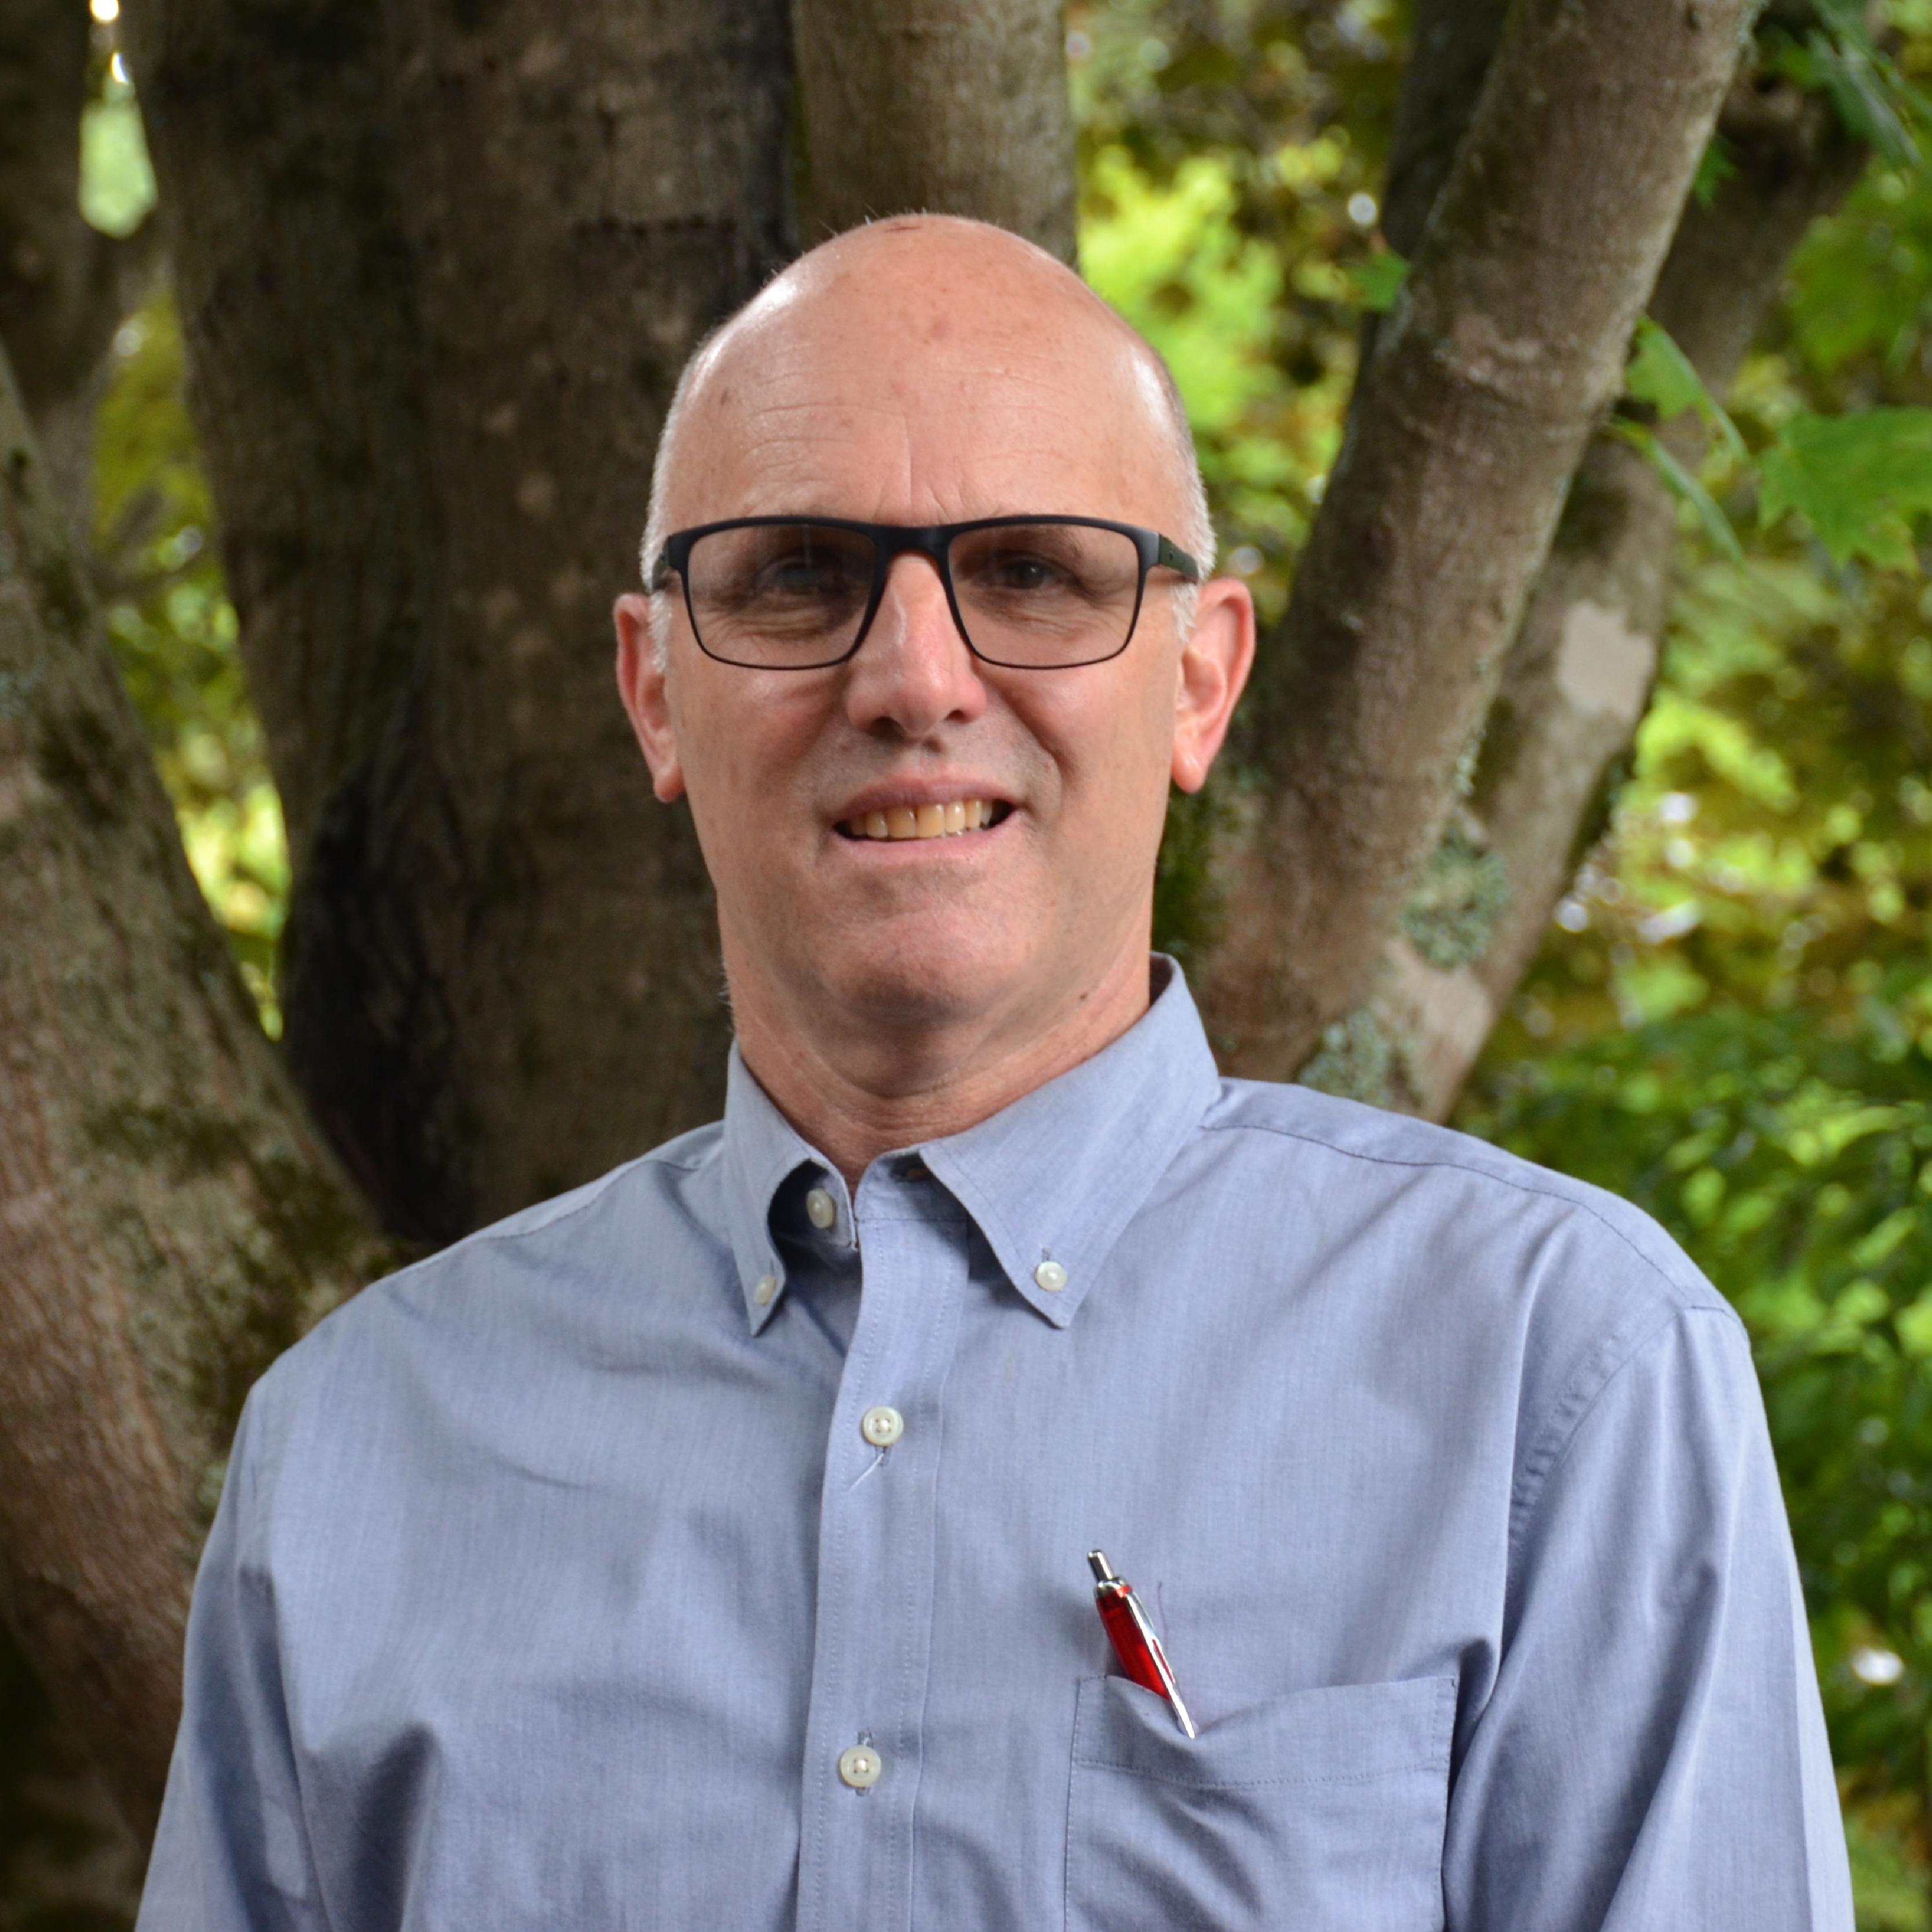 Rick Englehorn